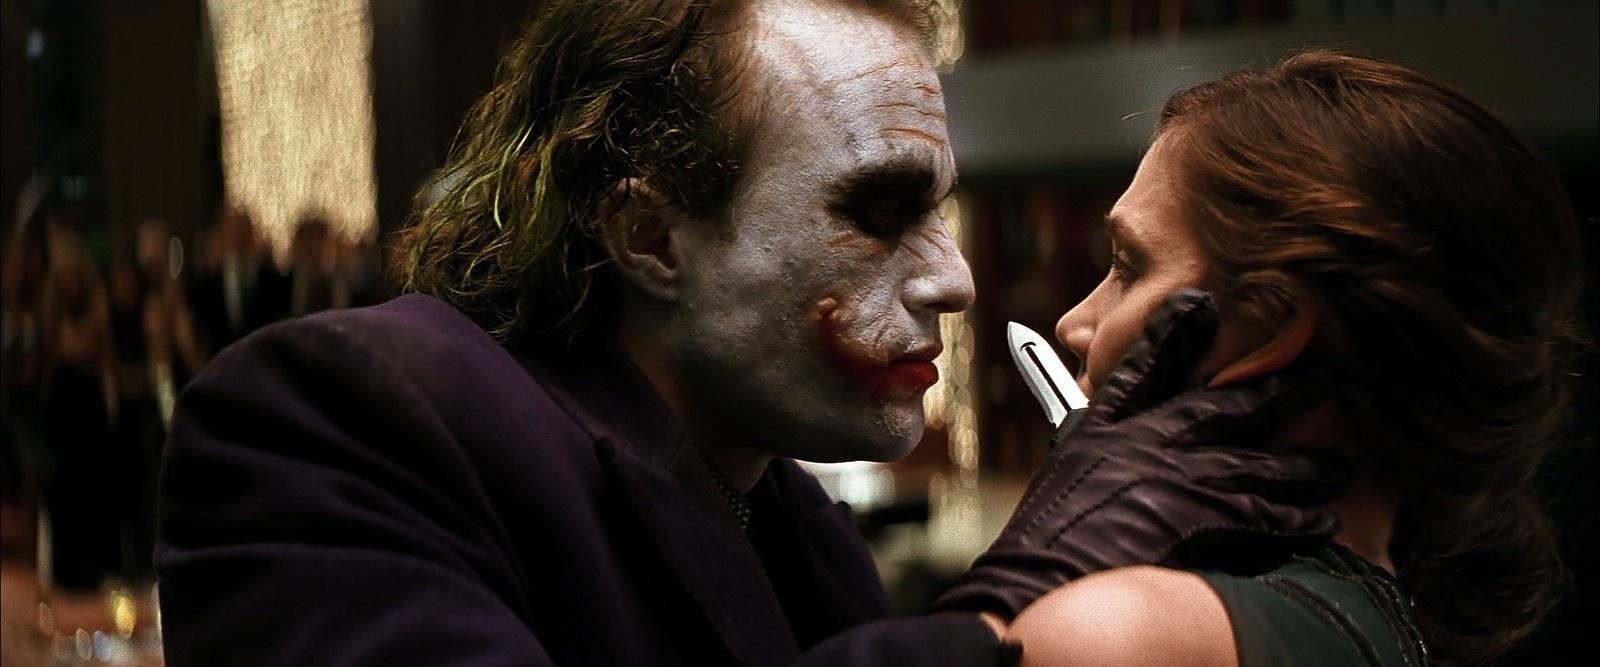 Galerie The Dark Knight : Le Chevalier noir 6